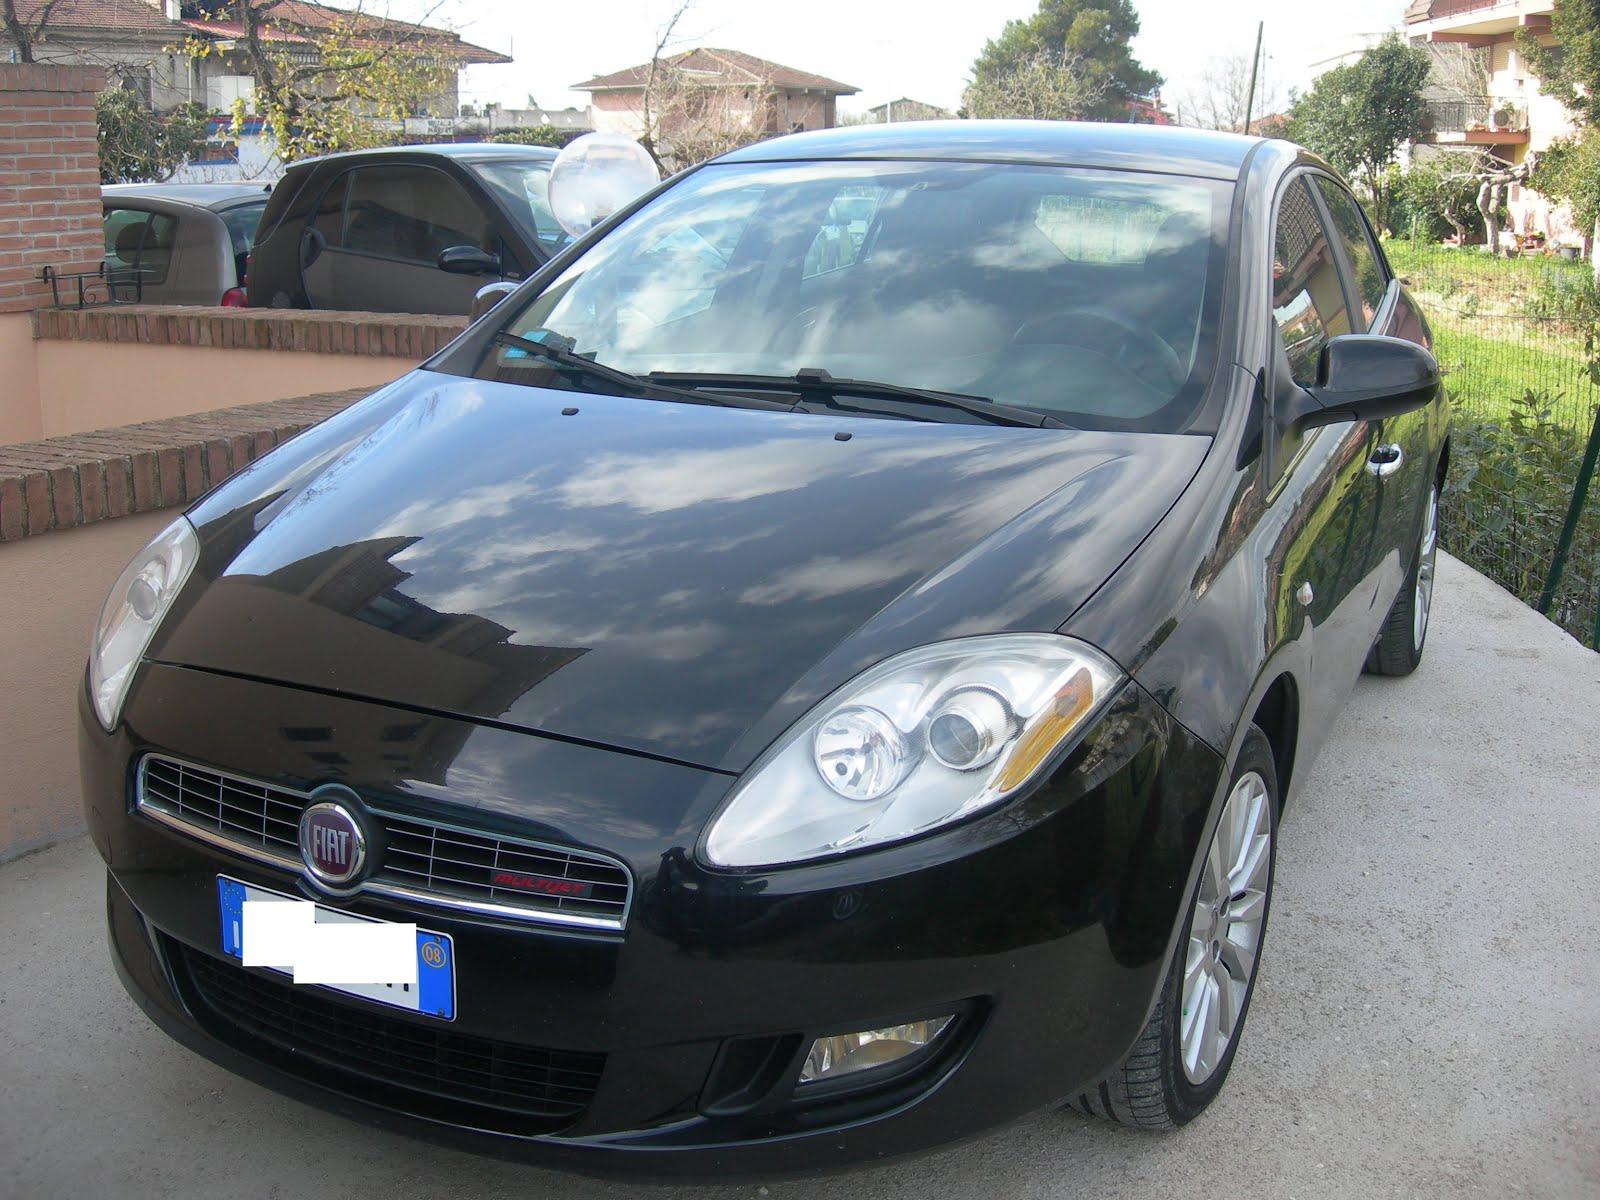 FIAT BRAVO 1.9 M.JET 150 CV ANNO 2008 MOD. EMOCTION